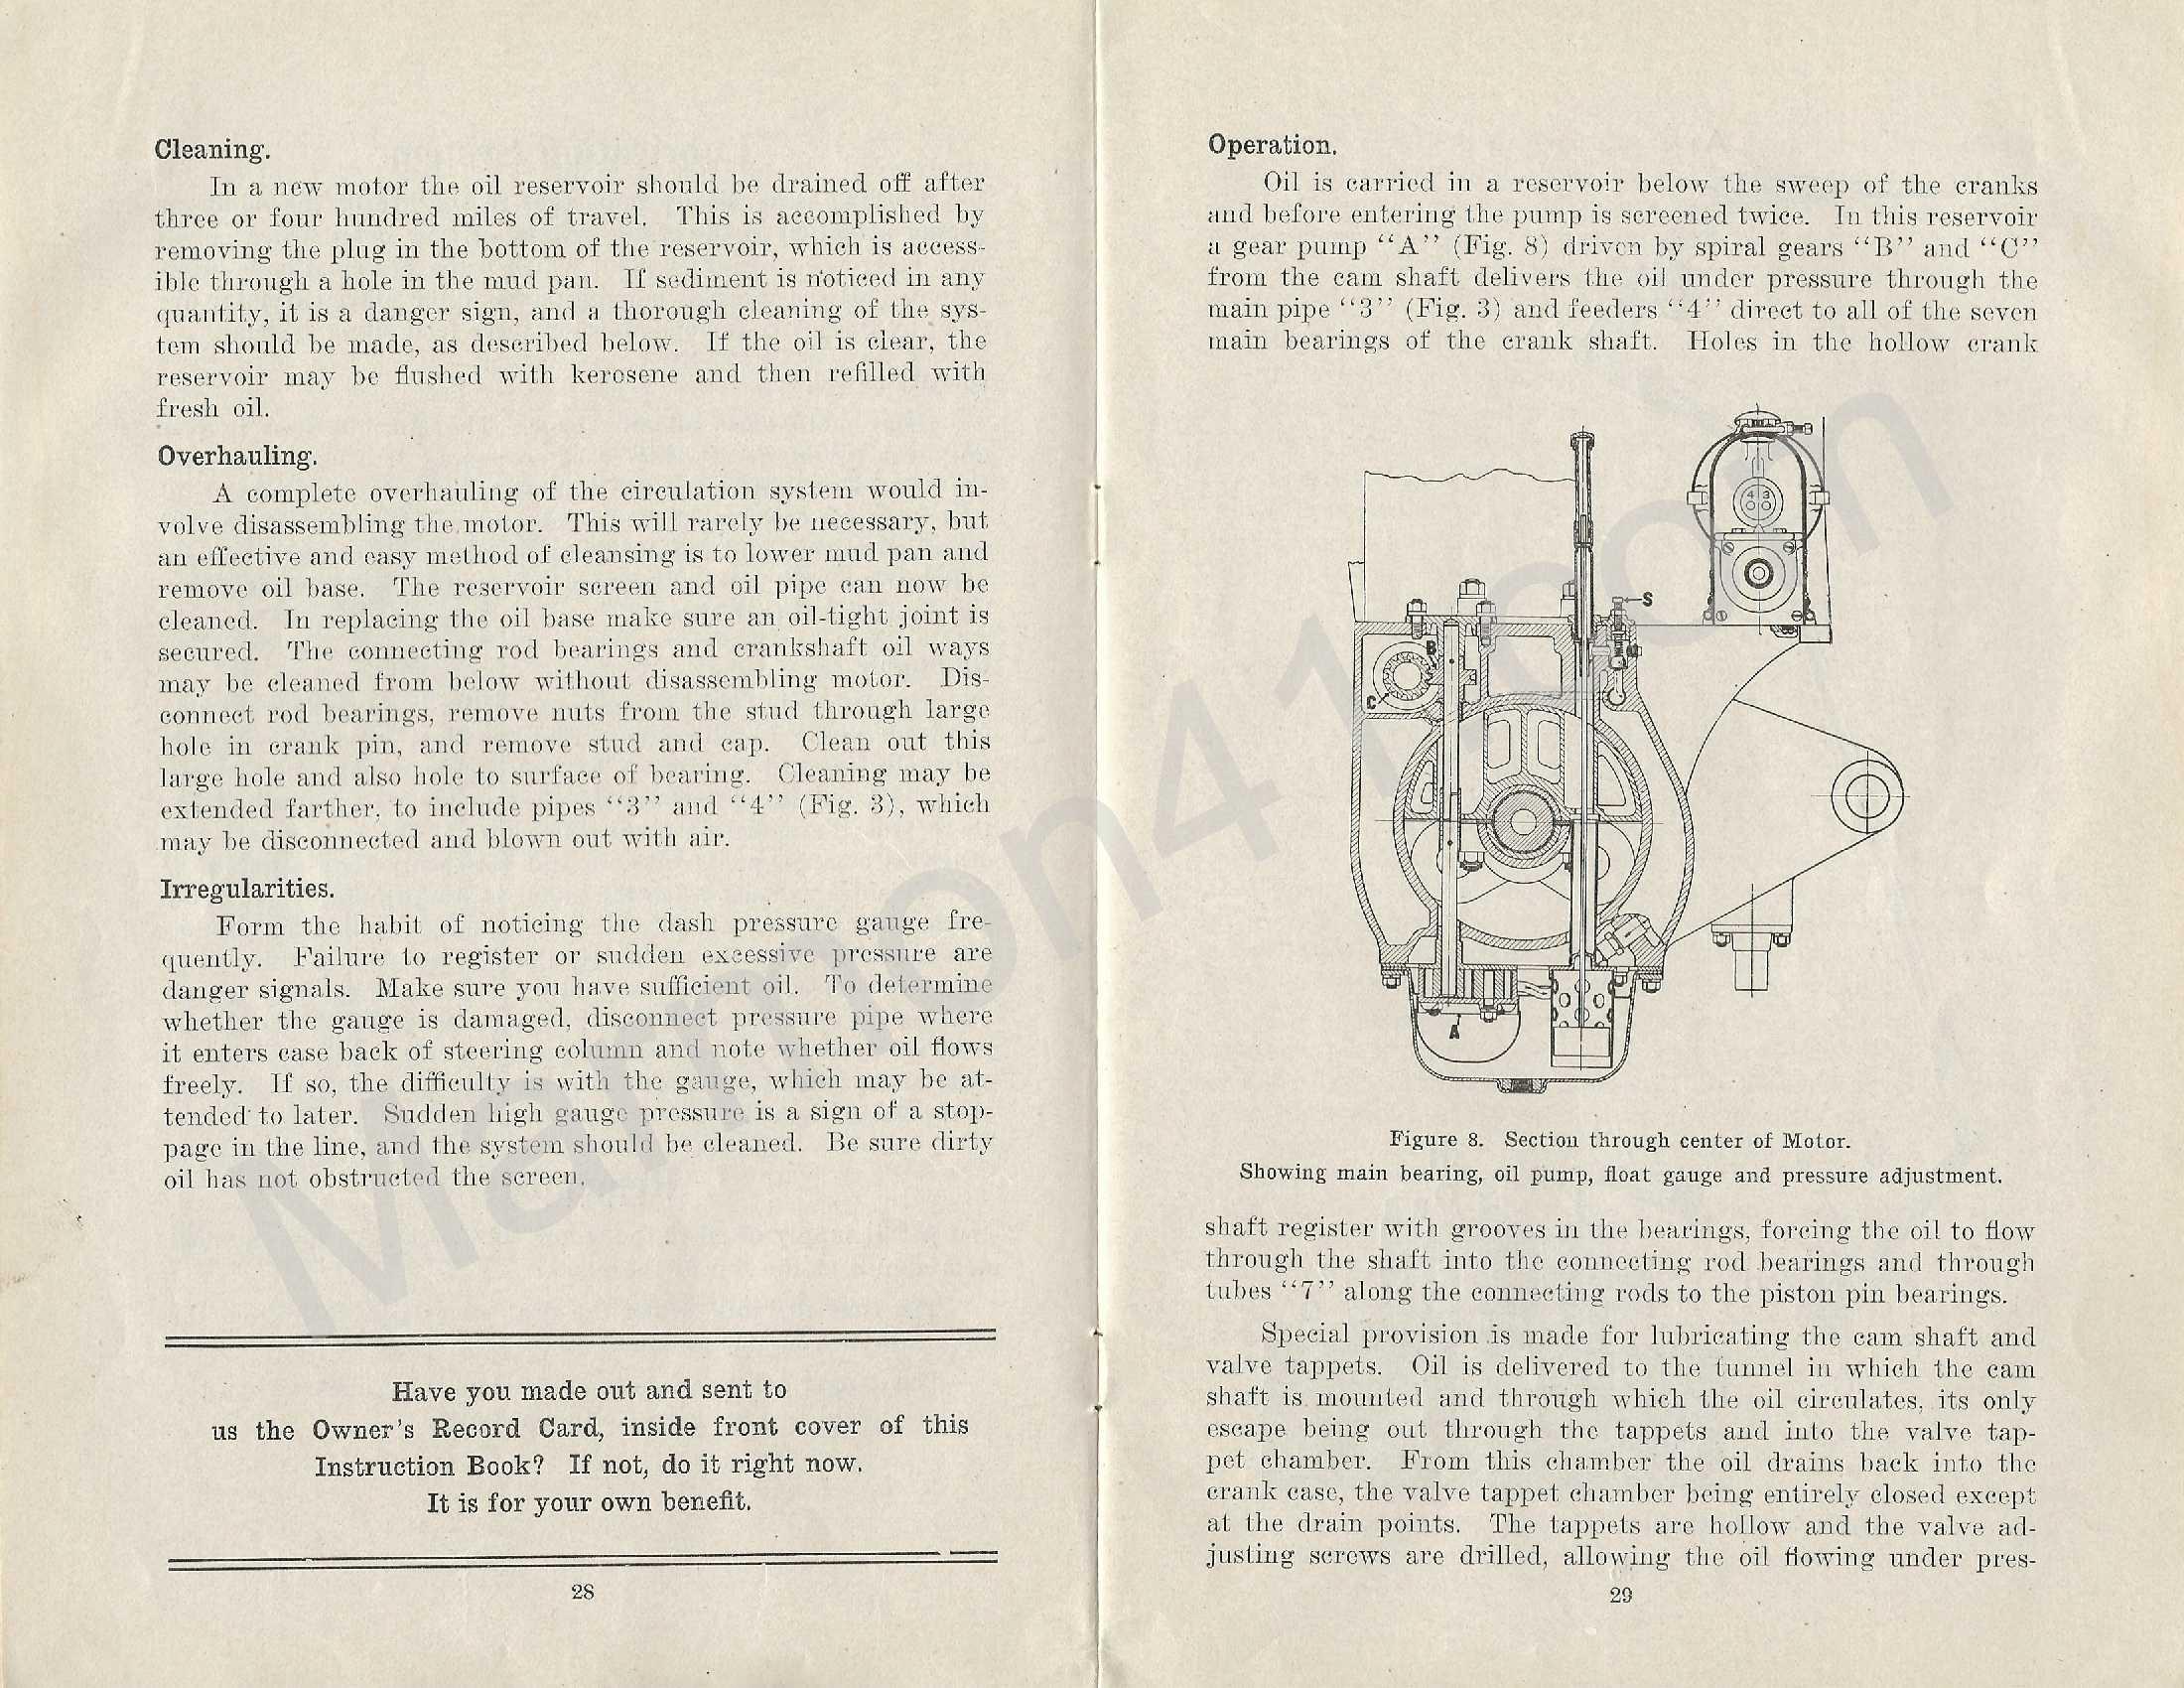 1915-07-01_Marmon41_Info_Book_1534-B_16